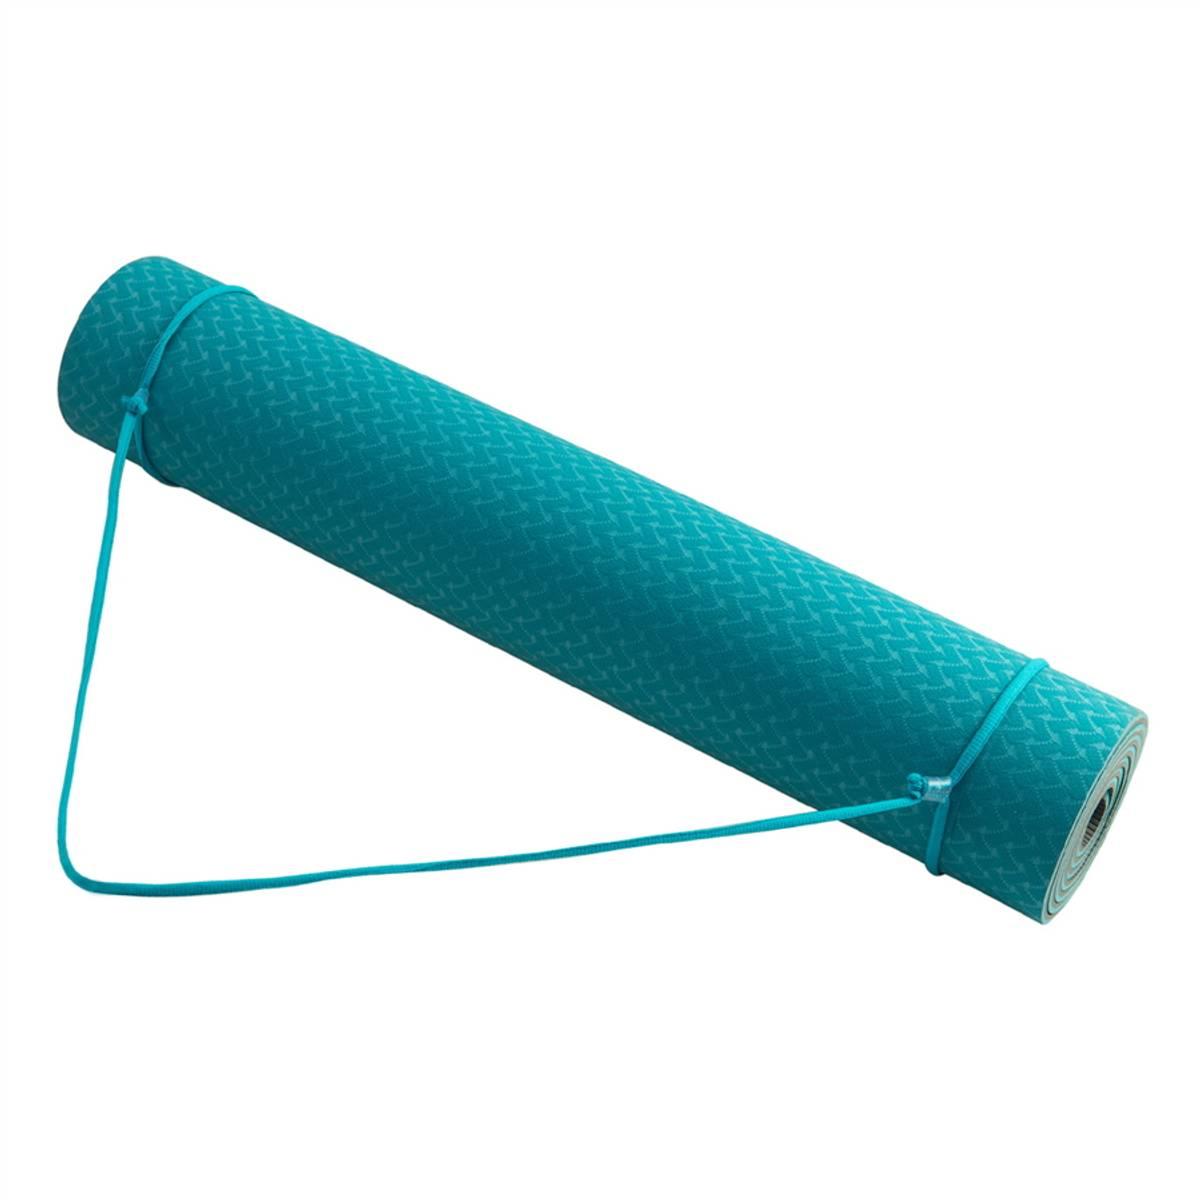 Dual yogamatte inSPORTline Yate TPE